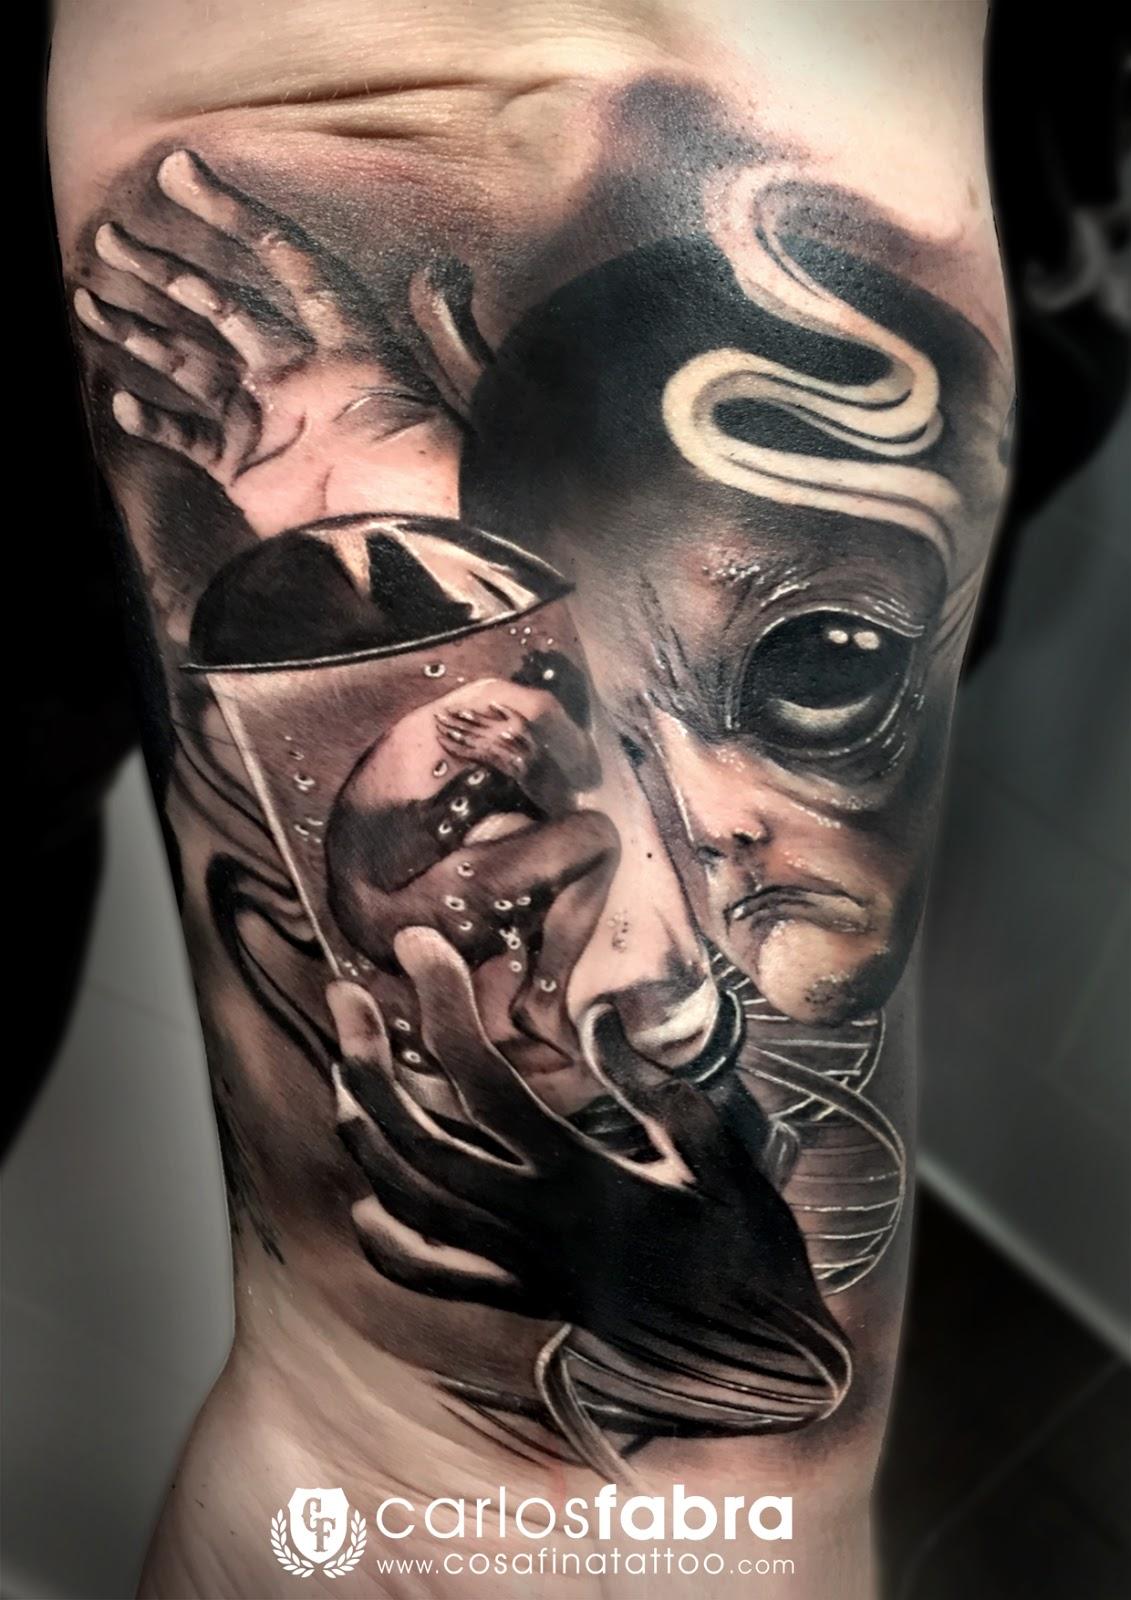 Cosafina Tattoo Carlos Art Studio Tatuaje Tatuajes Ovni Ufo